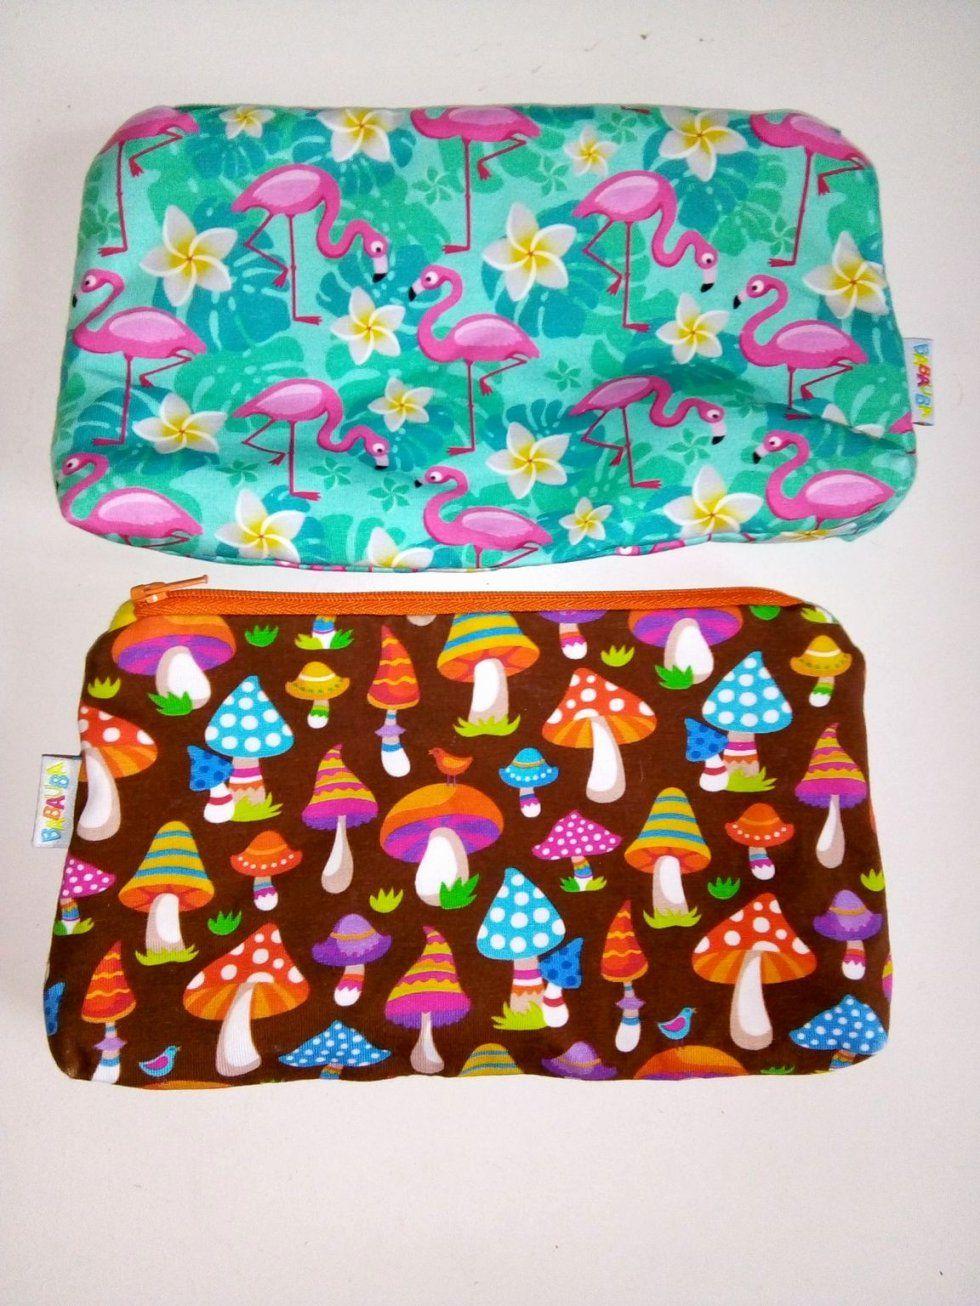 meradiso tubes matratze frisch camping luftmatratzen g nstig kaufen von meradiso tubes matratze. Black Bedroom Furniture Sets. Home Design Ideas